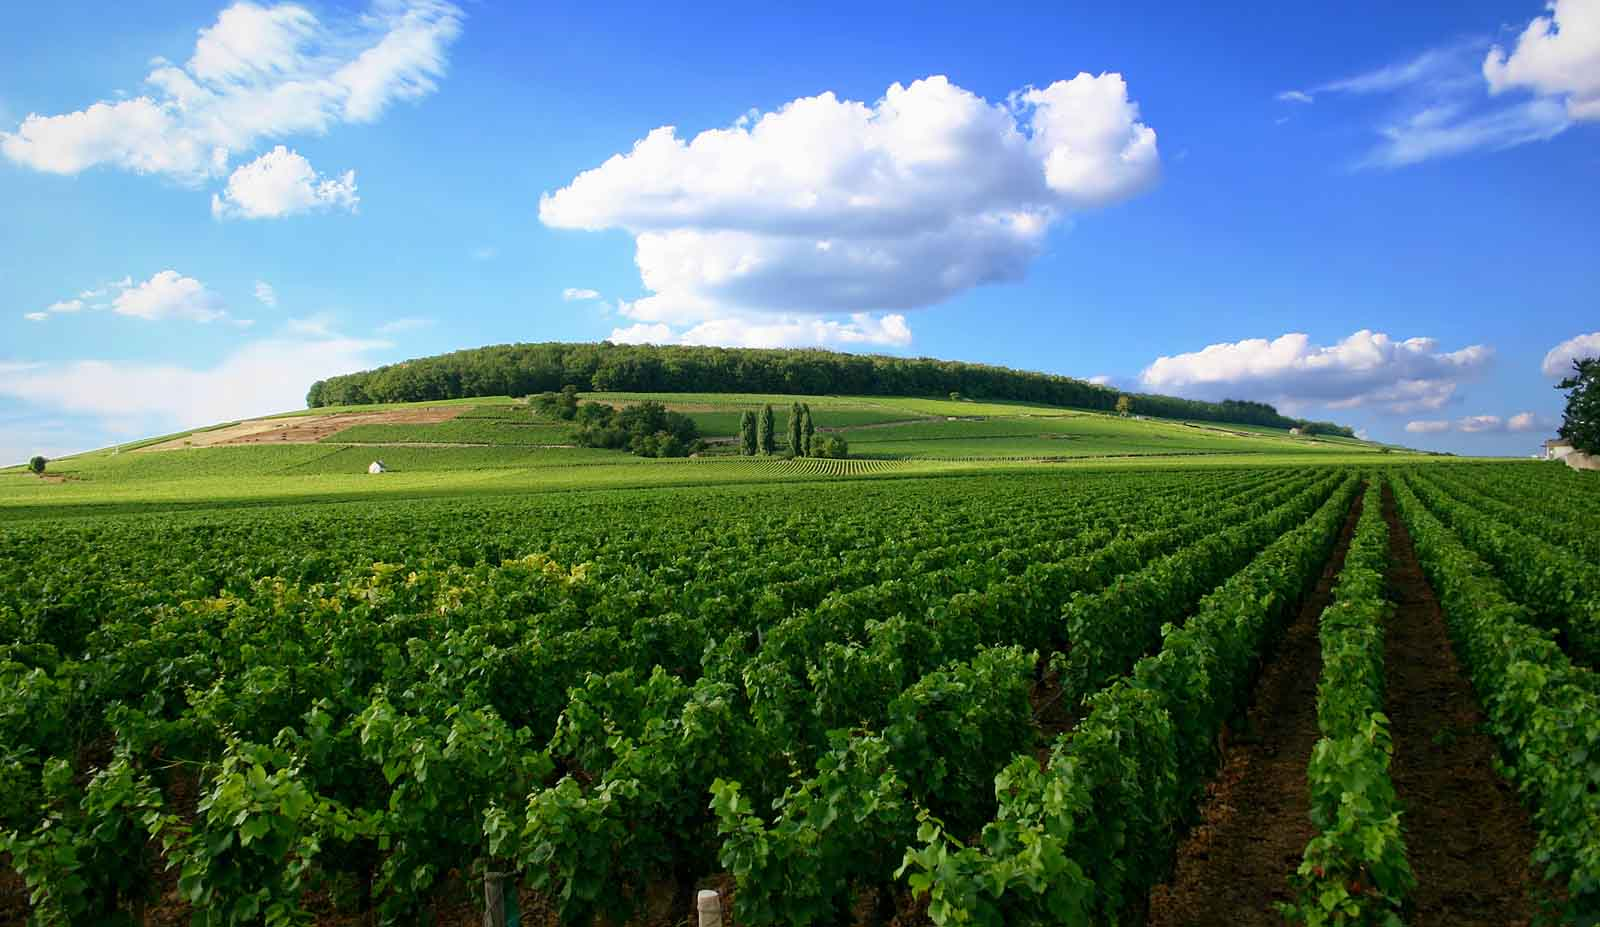 Burgundy, France vineyard 2